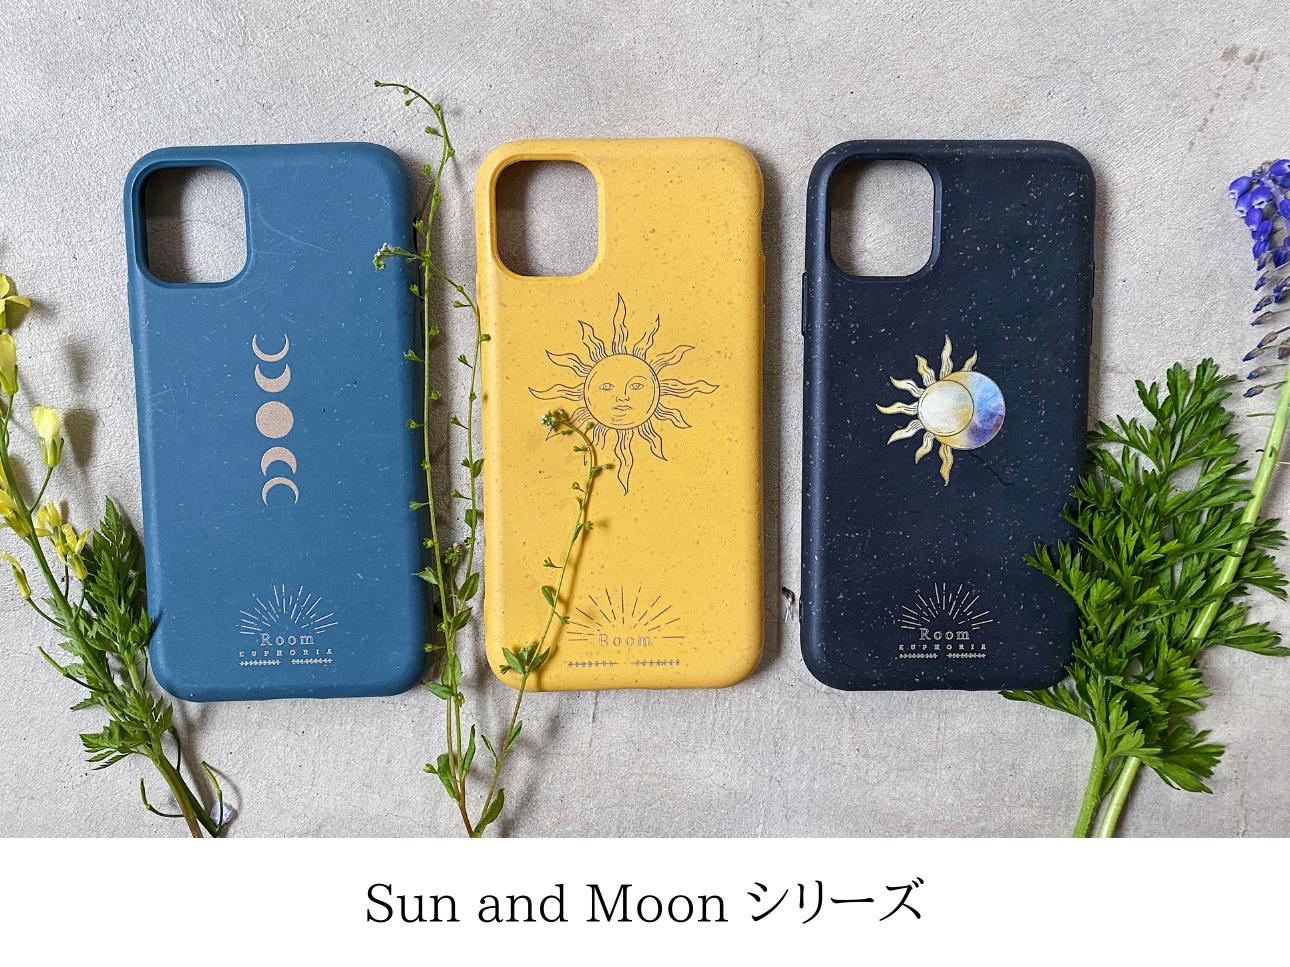 Sun and Moon シリーズ